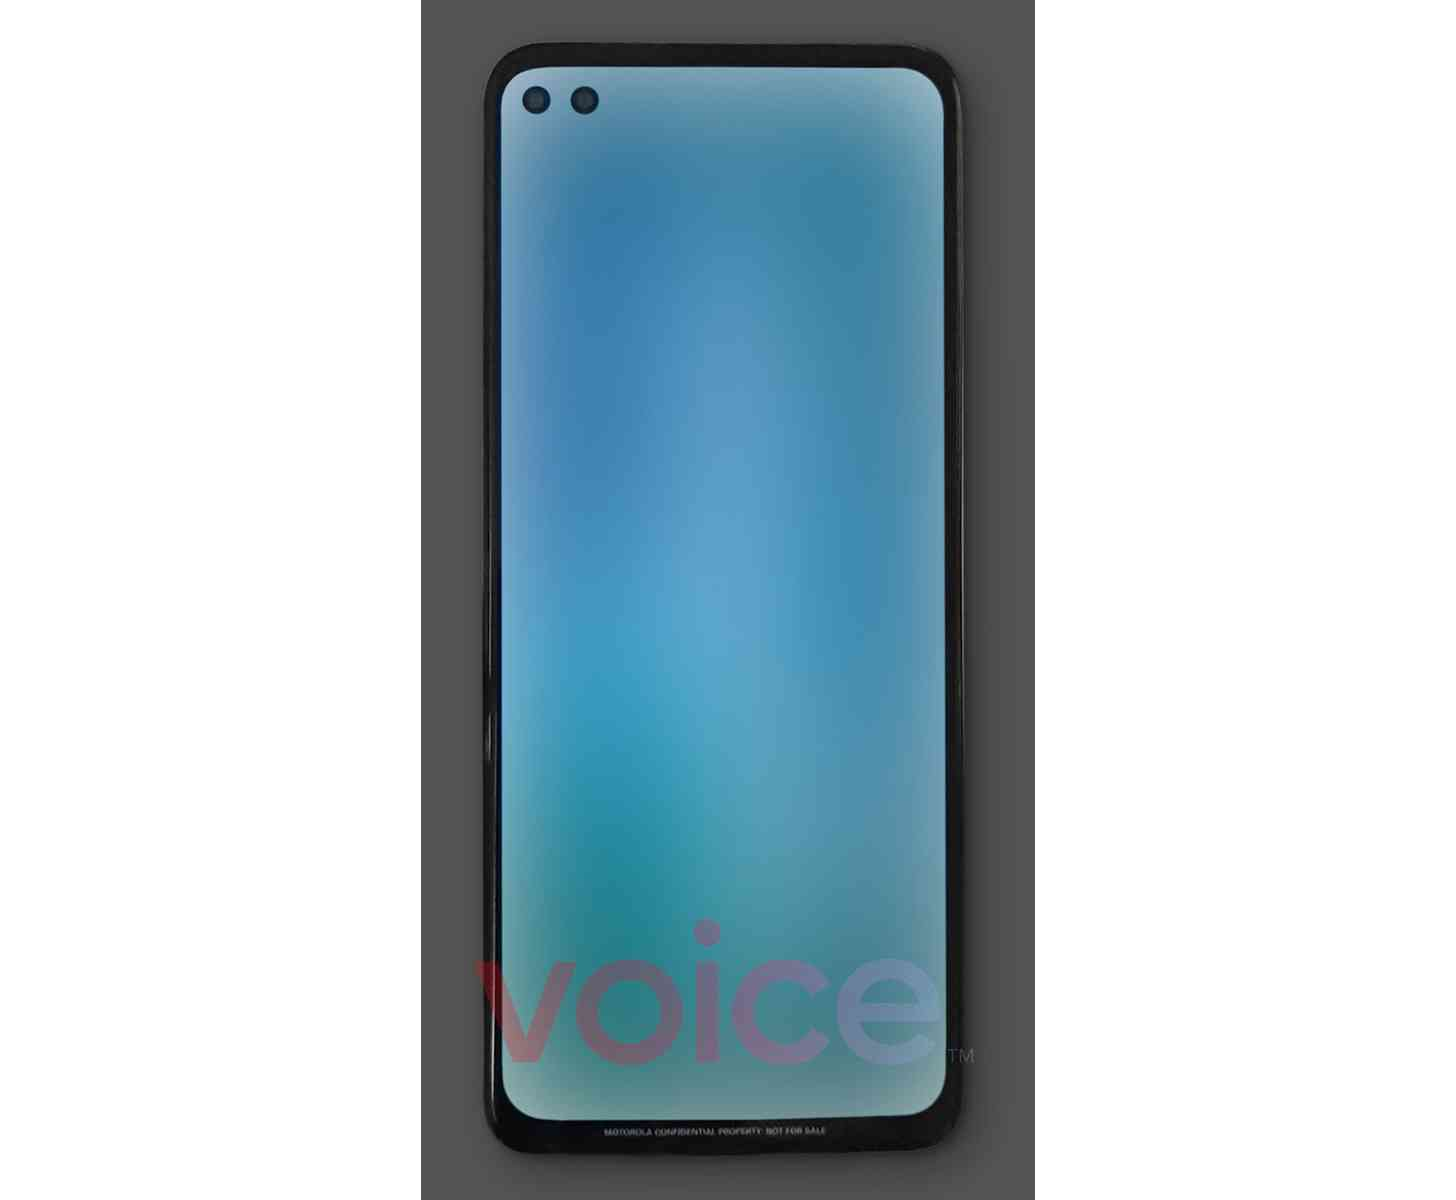 Motorola Nio image leak